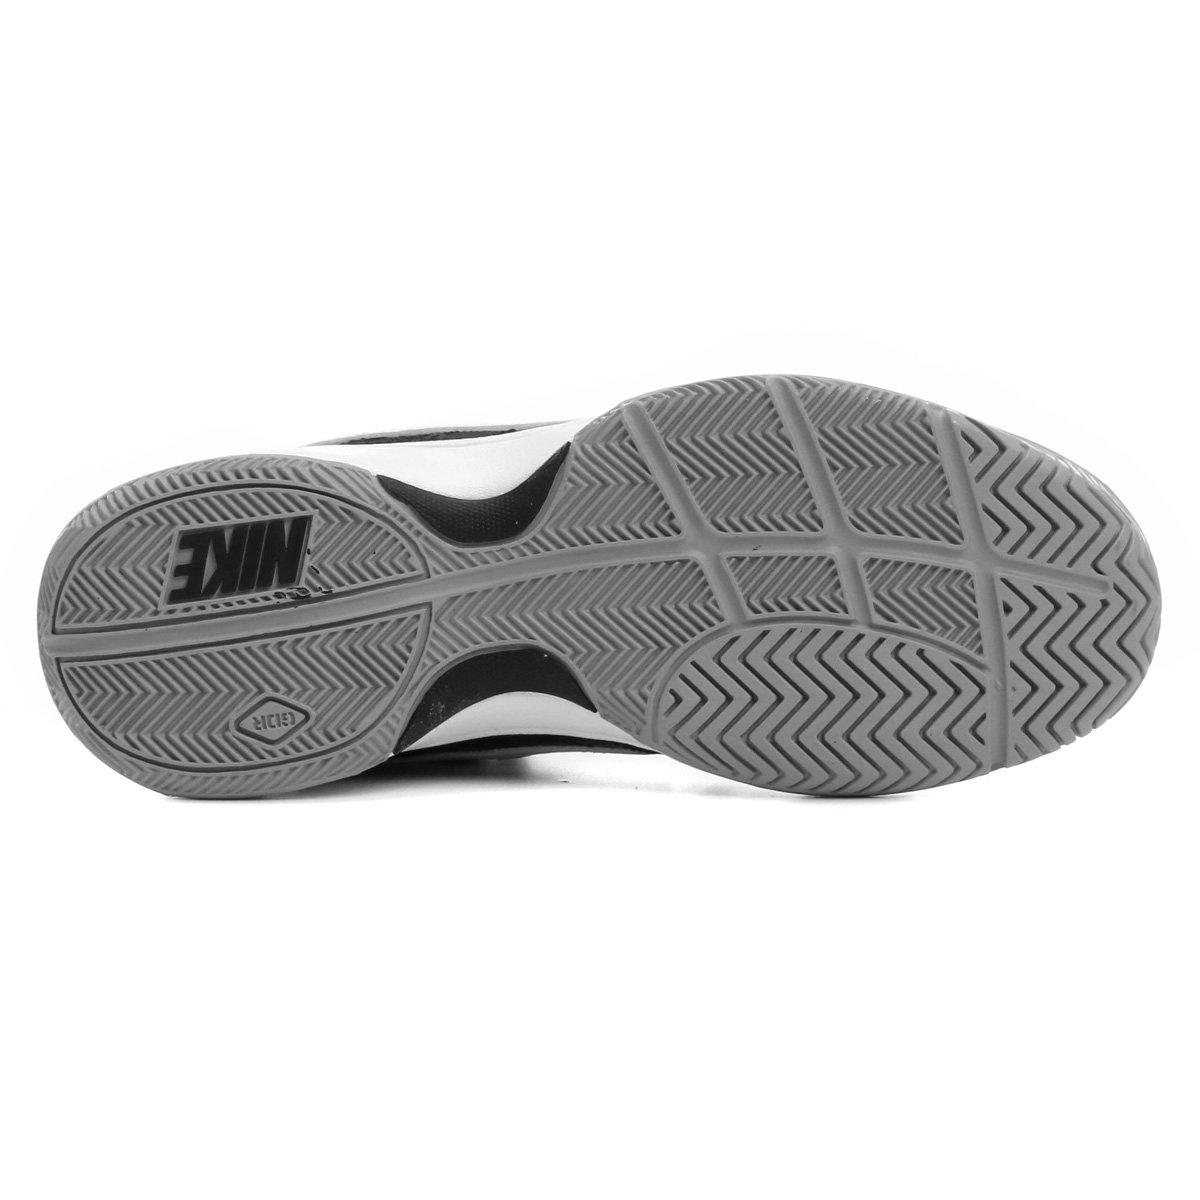 Tênis Nike Court Lite Masculino - Preto e Branco - Compre Agora ... 97dad6bc98b3b